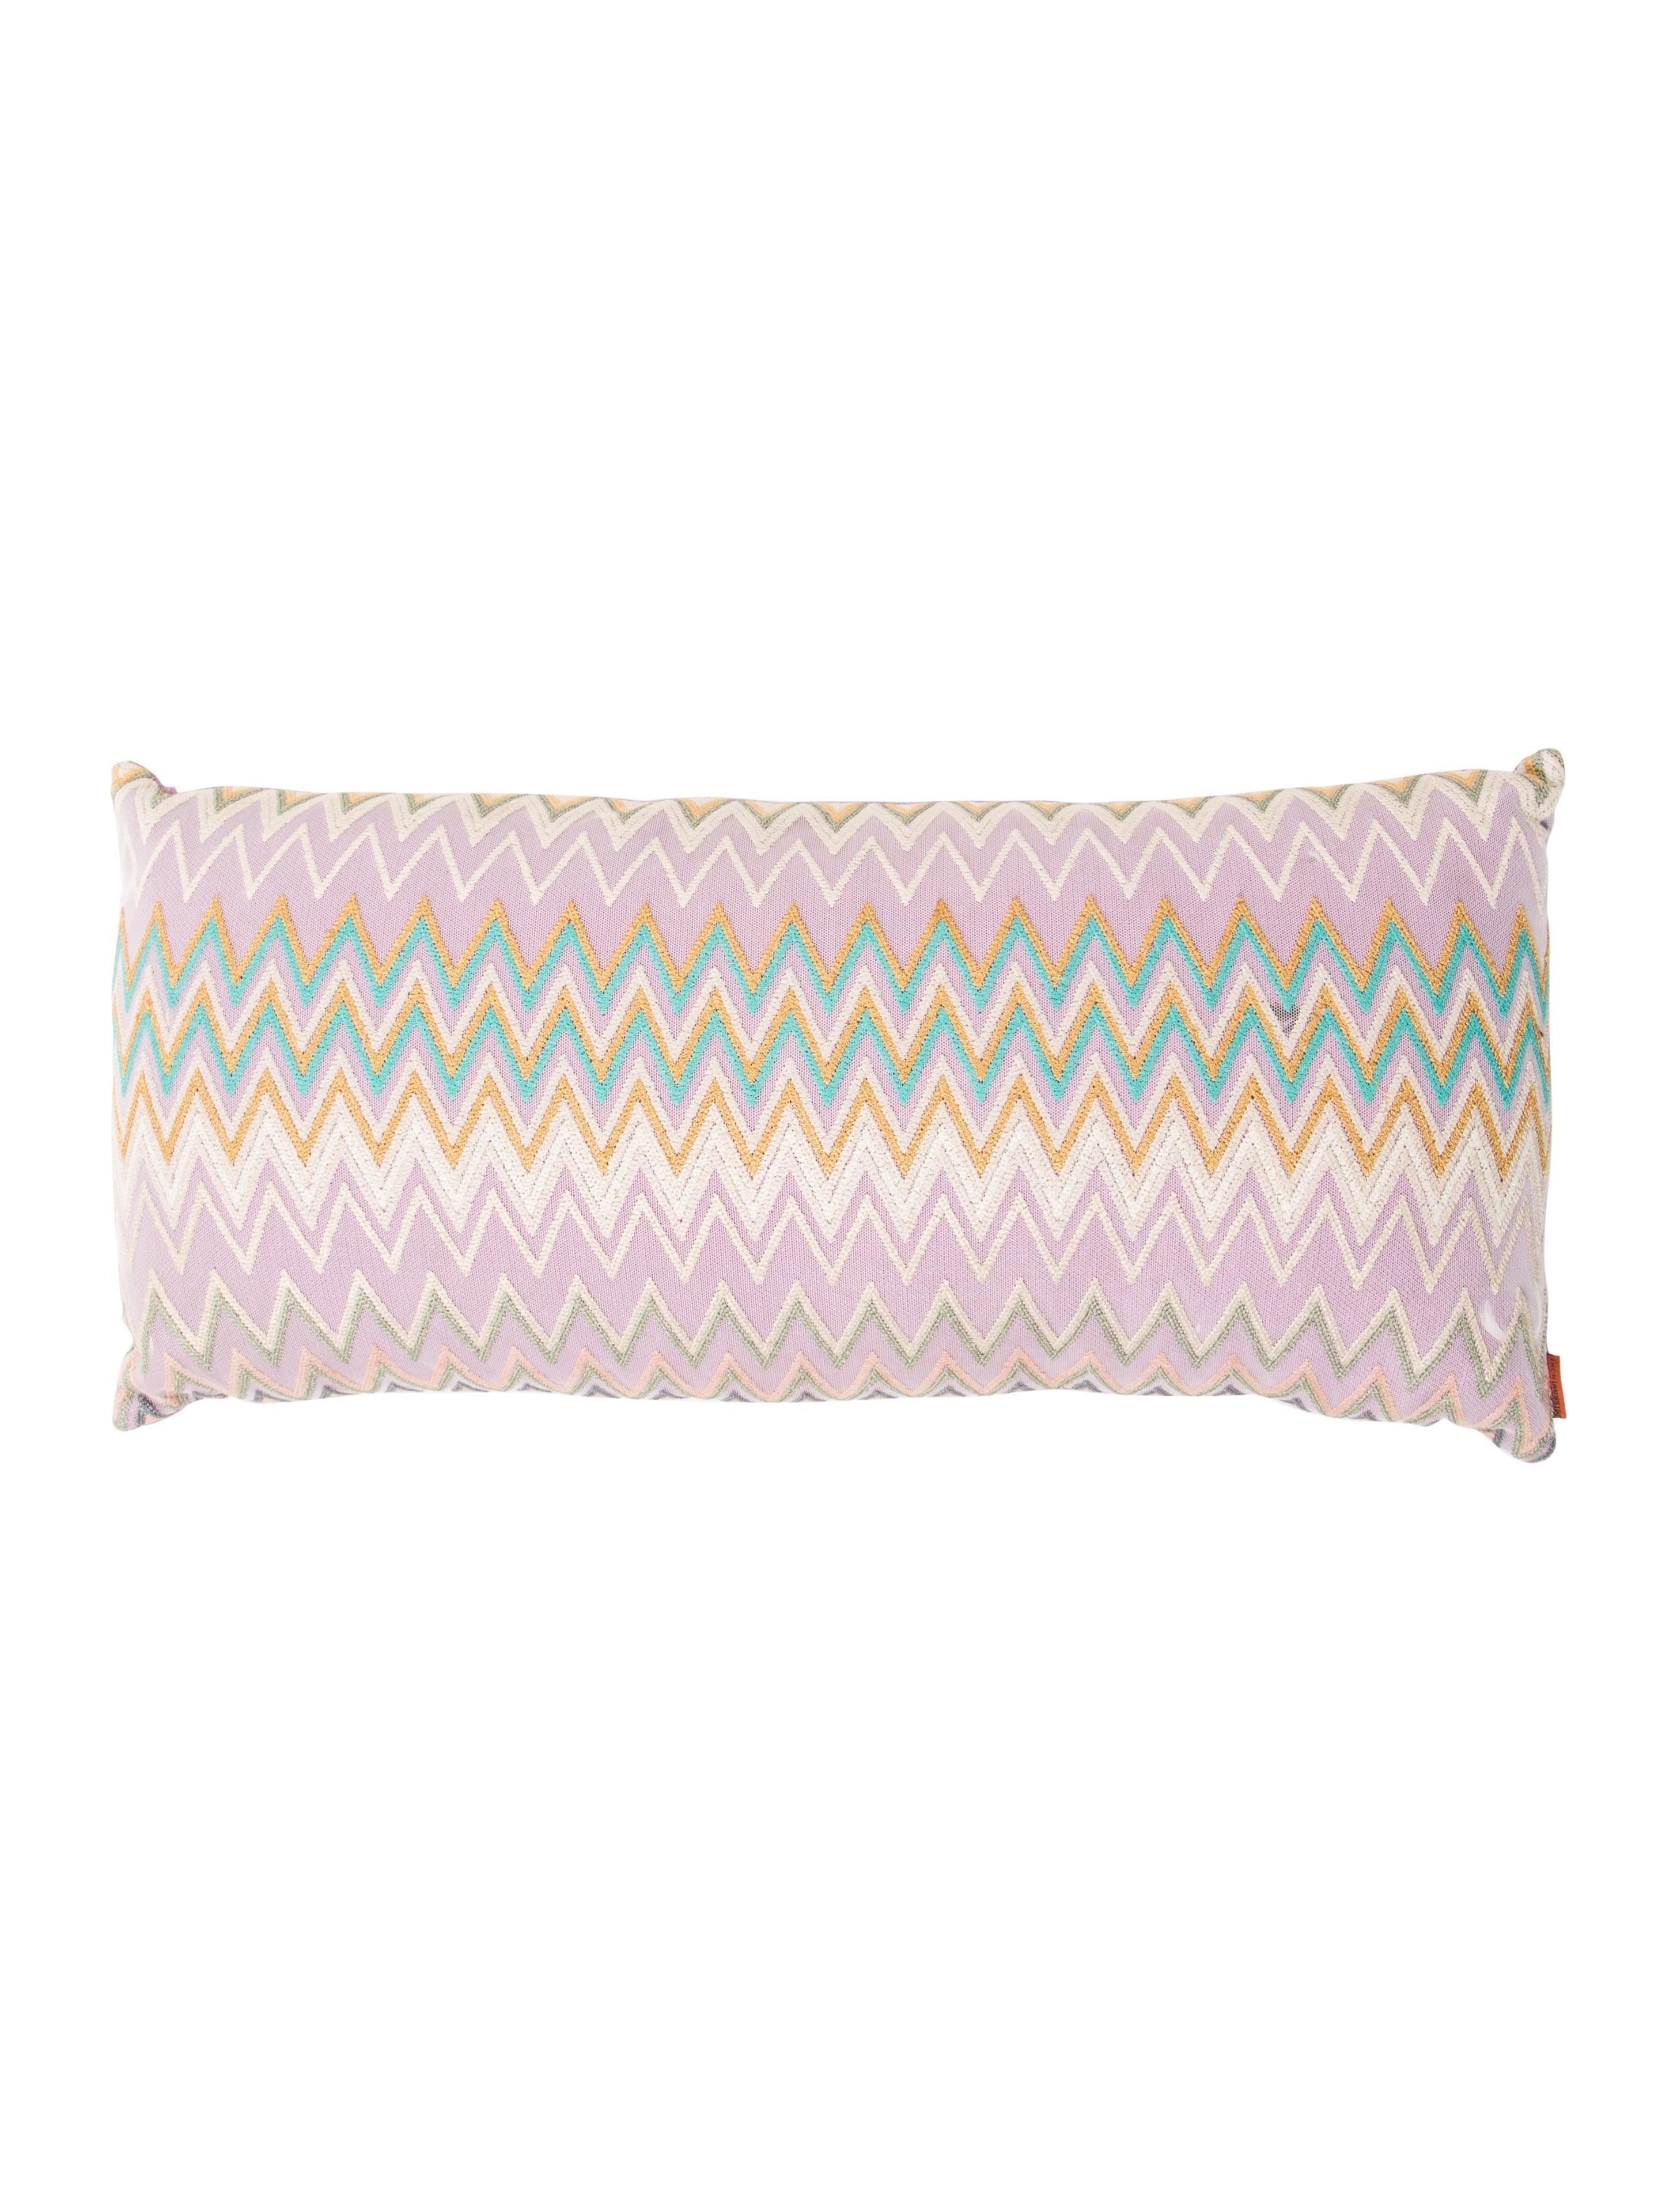 pillow plaid missoni by check large pillows loading moda tailored operandi coat long